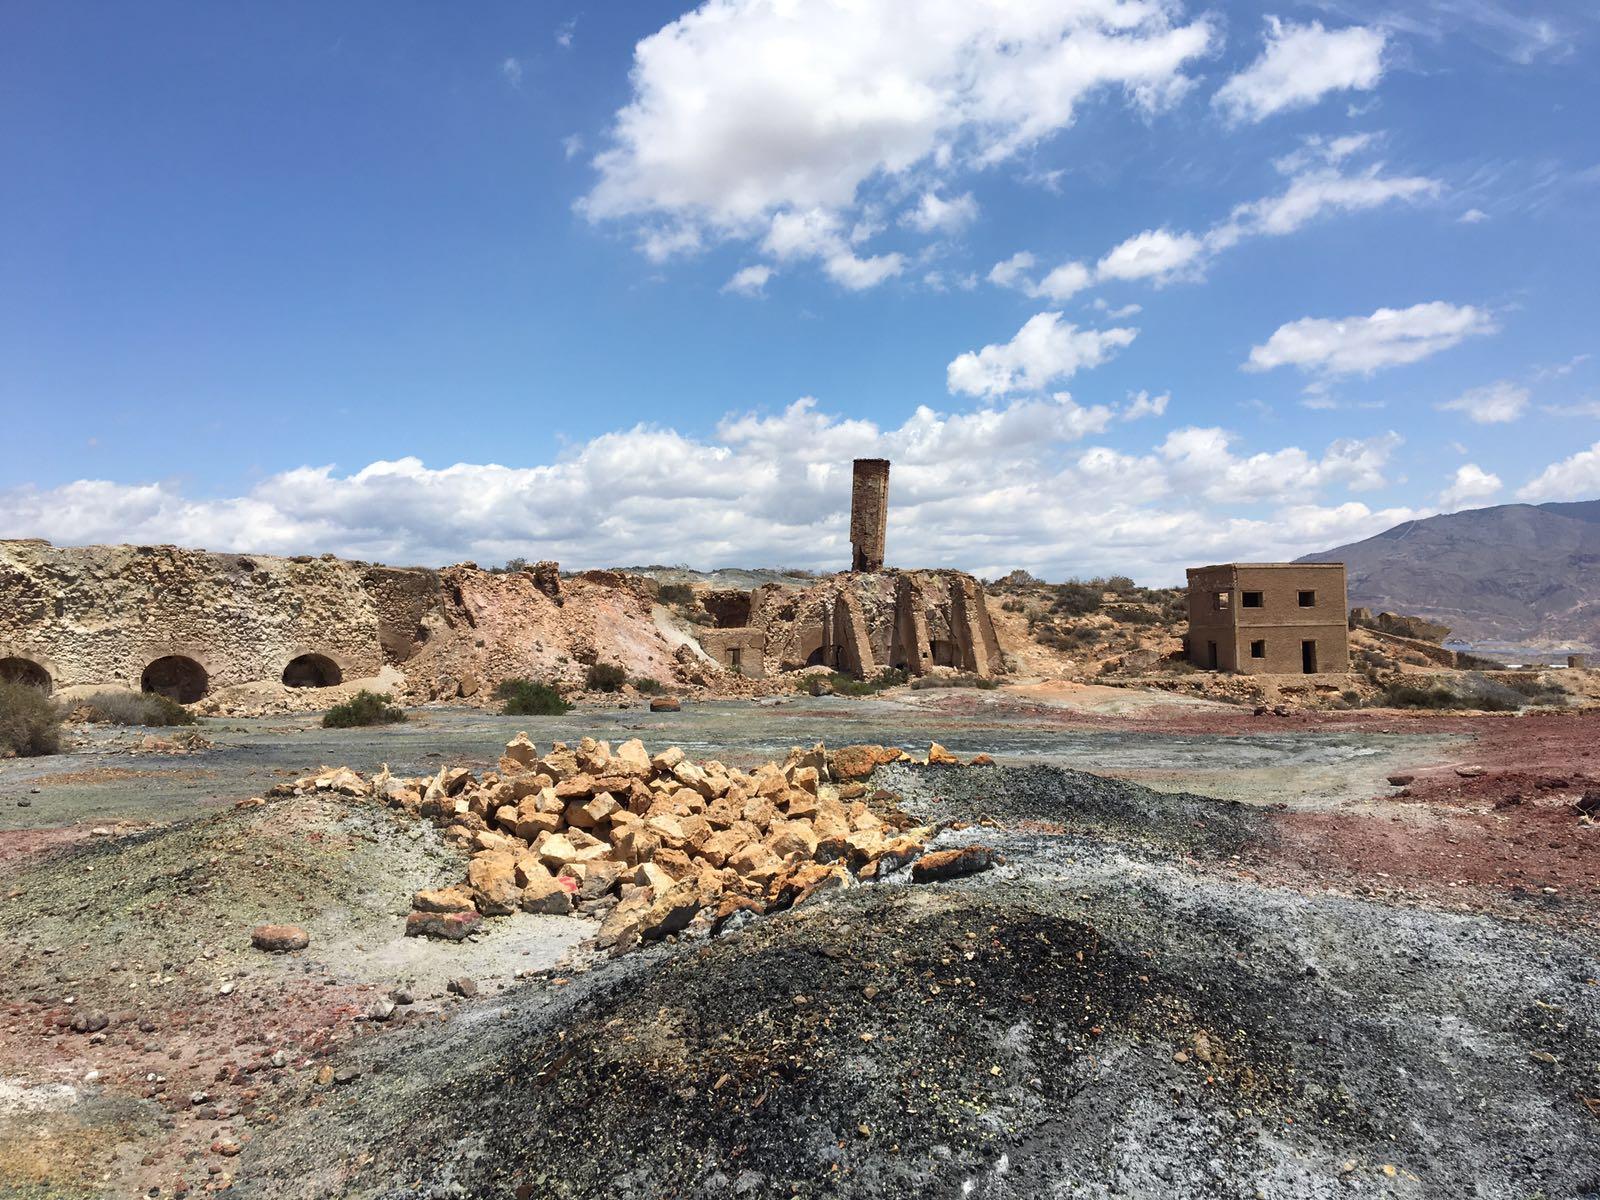 Minas de Azufre - Benahadux